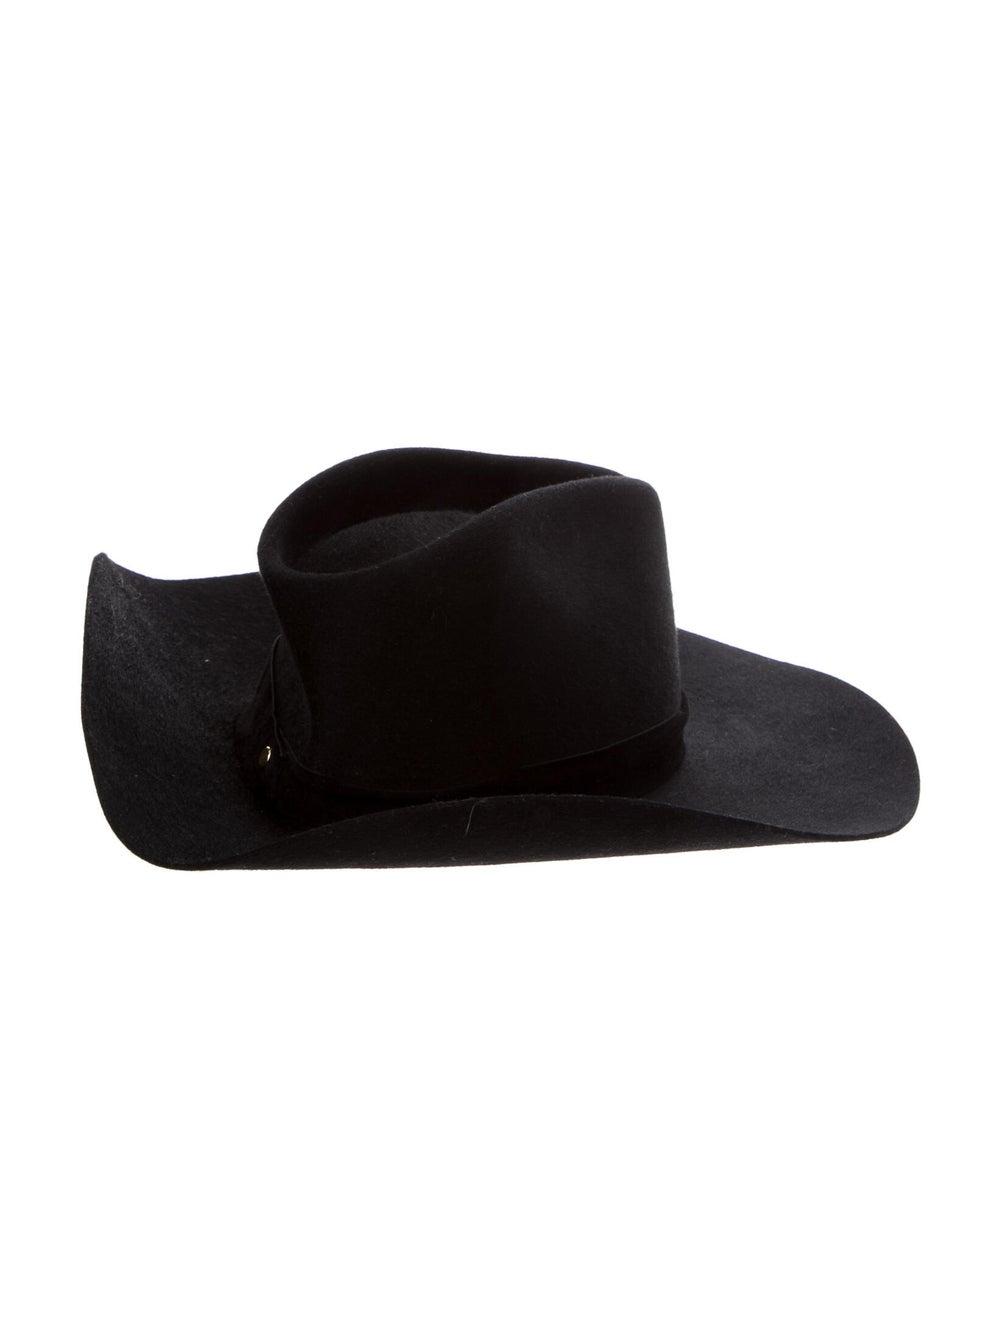 Janessa Leone Wide Brim Hat w/ Tags Black - image 2